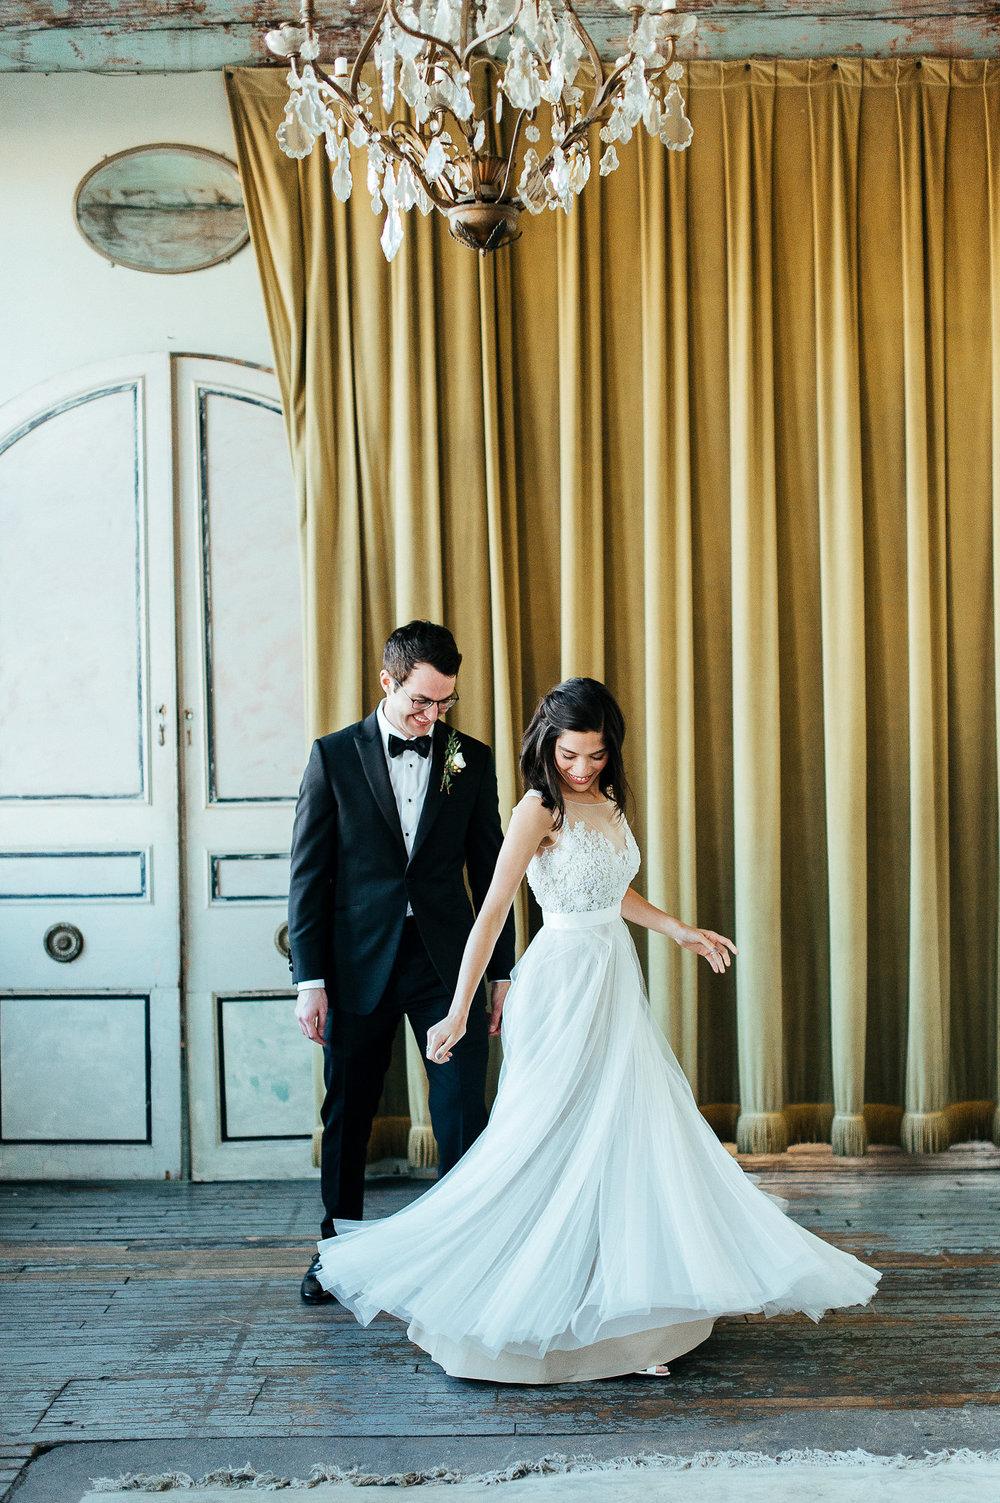 wedding_portraits_details35.JPG